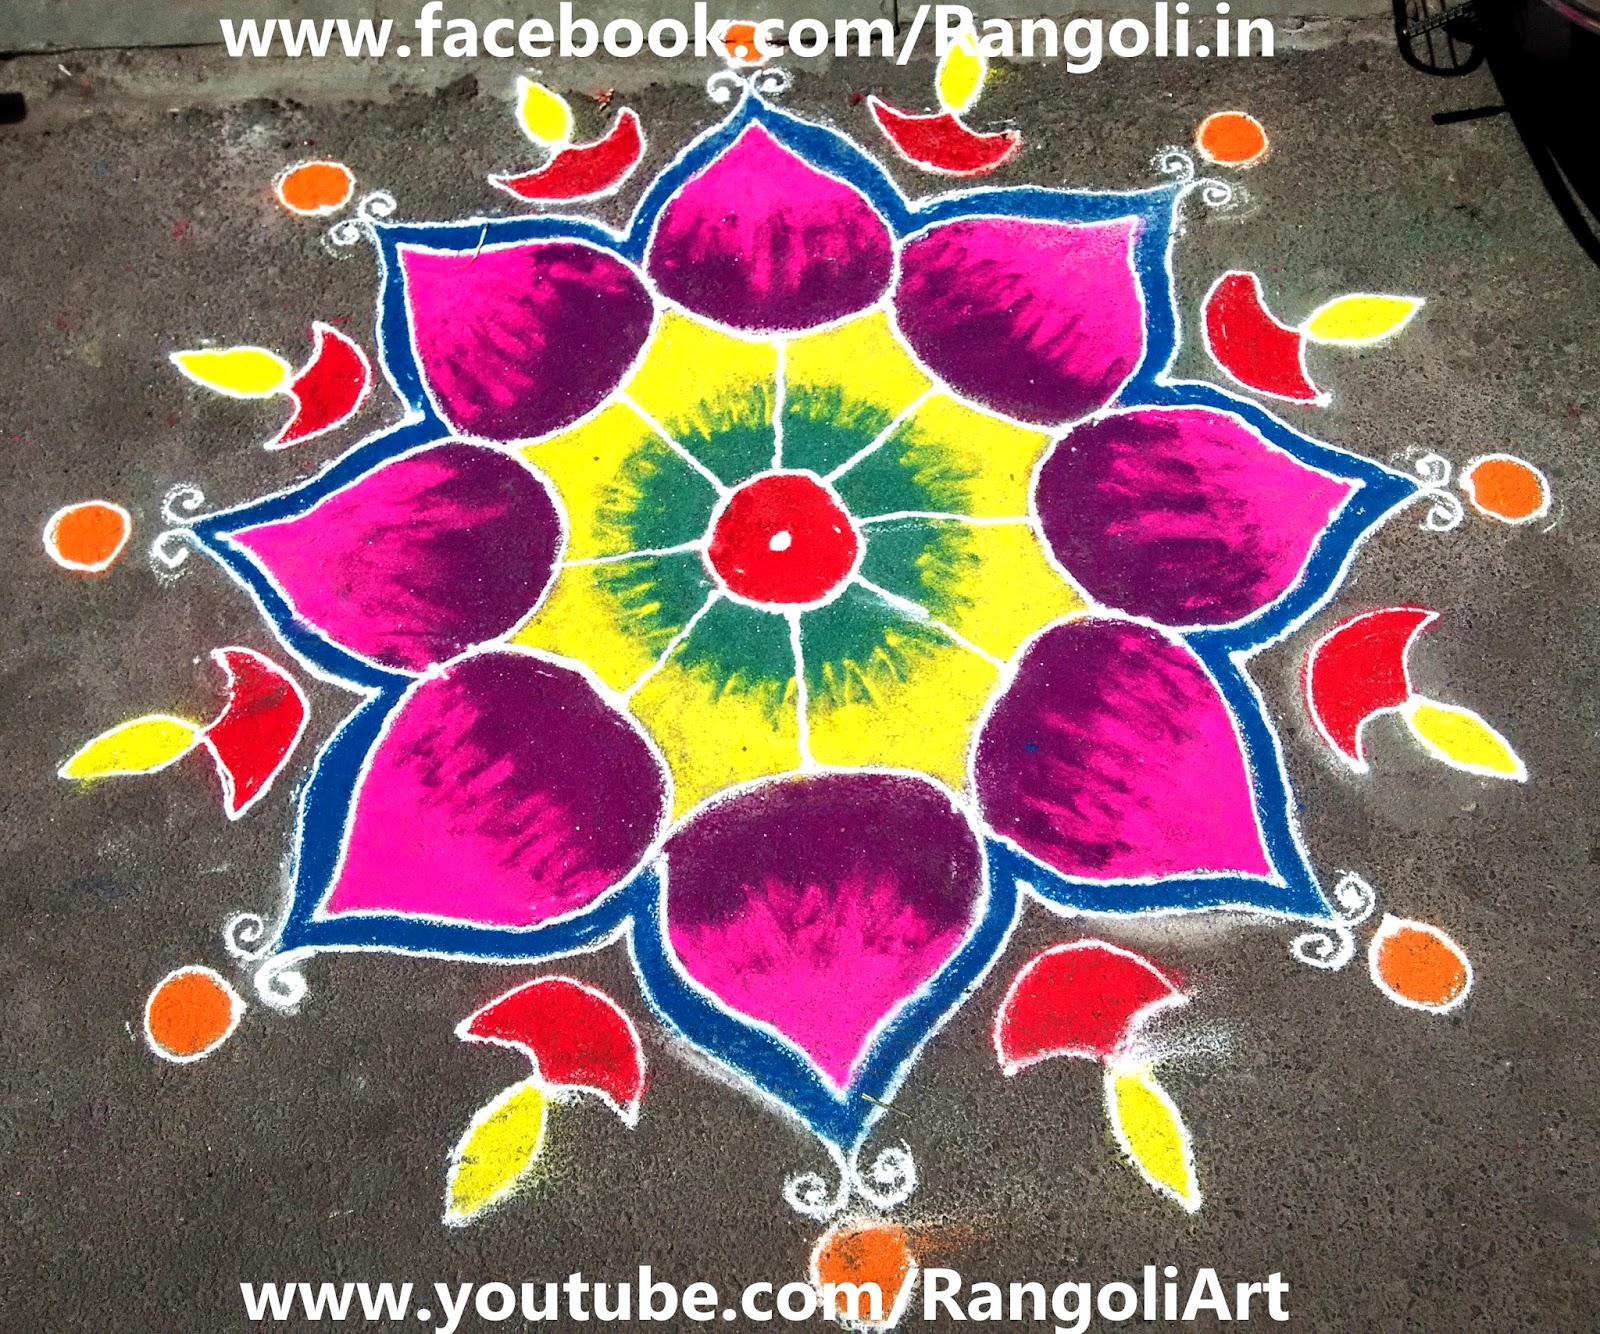 Diwali Rangoli , Kolam , Designs Images: Rangoli images of Diwali 2014